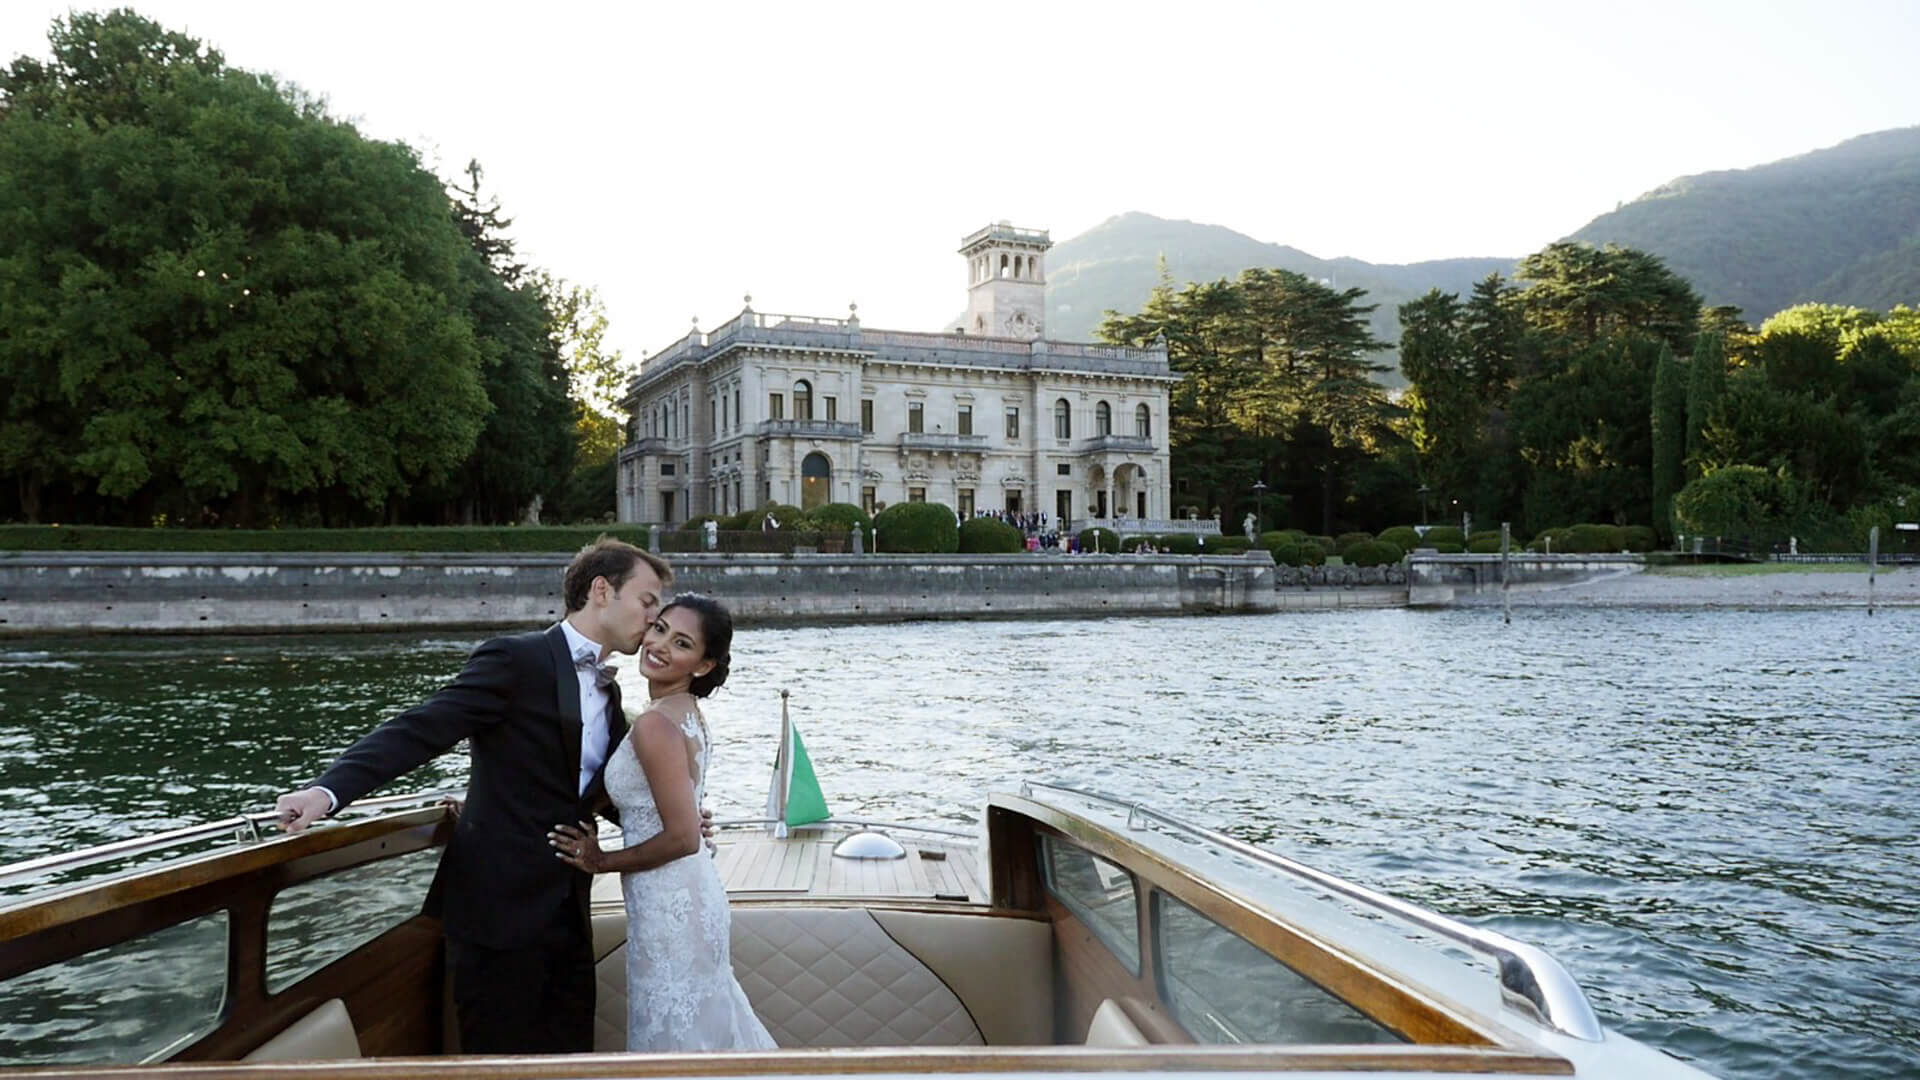 Ash e Maurizio - Matrimonio a Villa Erba, Como